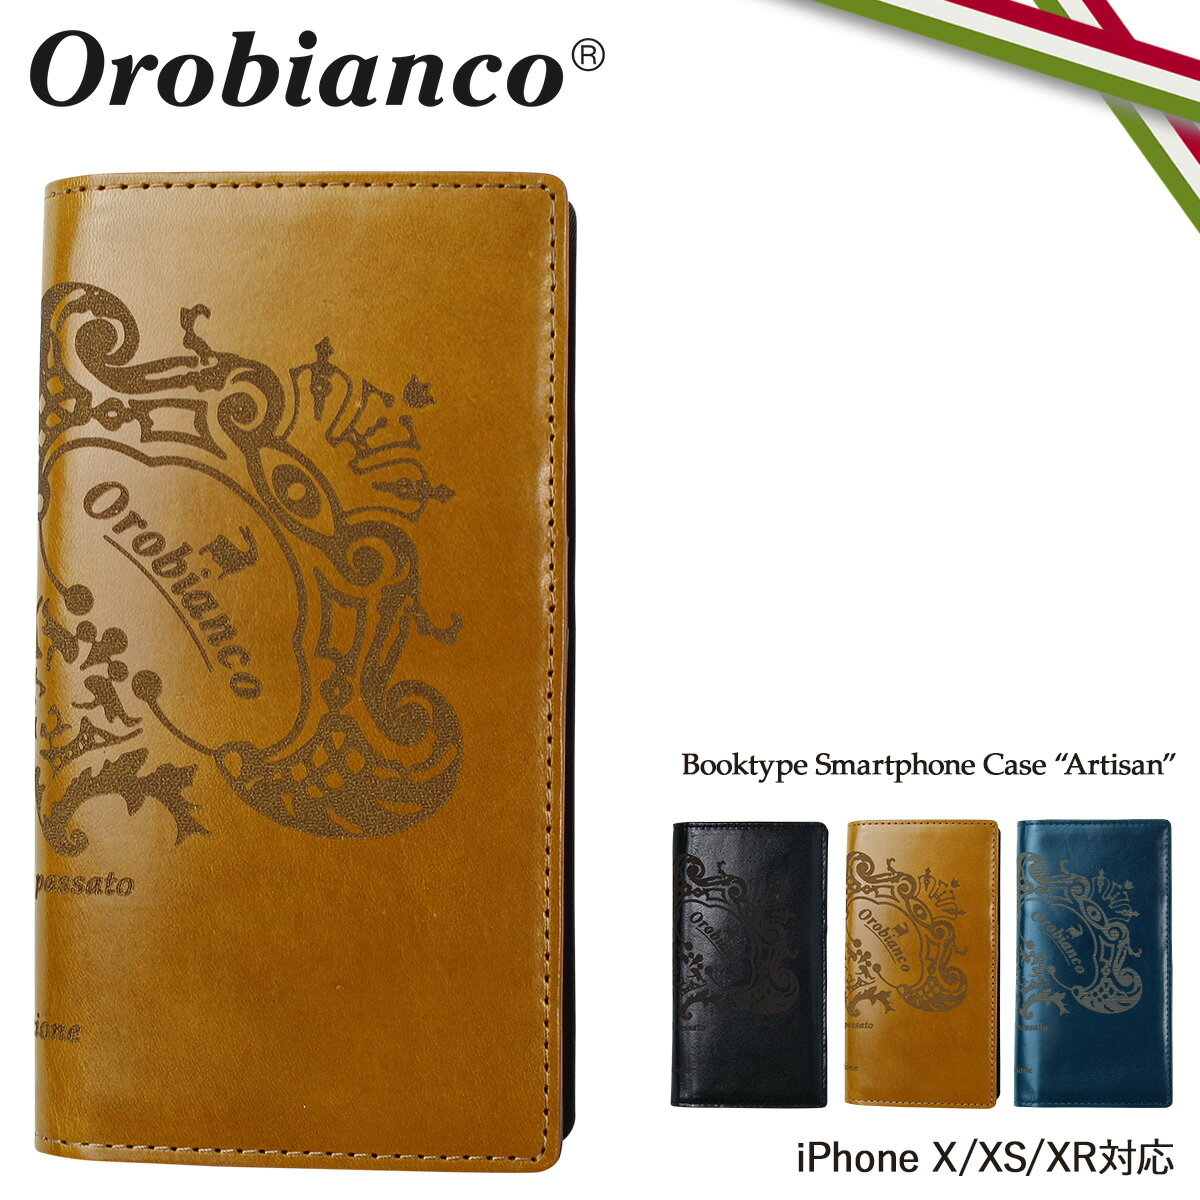 Orobianco オロビアンコ iPhone XR X XS ケース 手帳型 スマホ アイフォン ARTISAN レザー メンズ レディース ORIP-0003